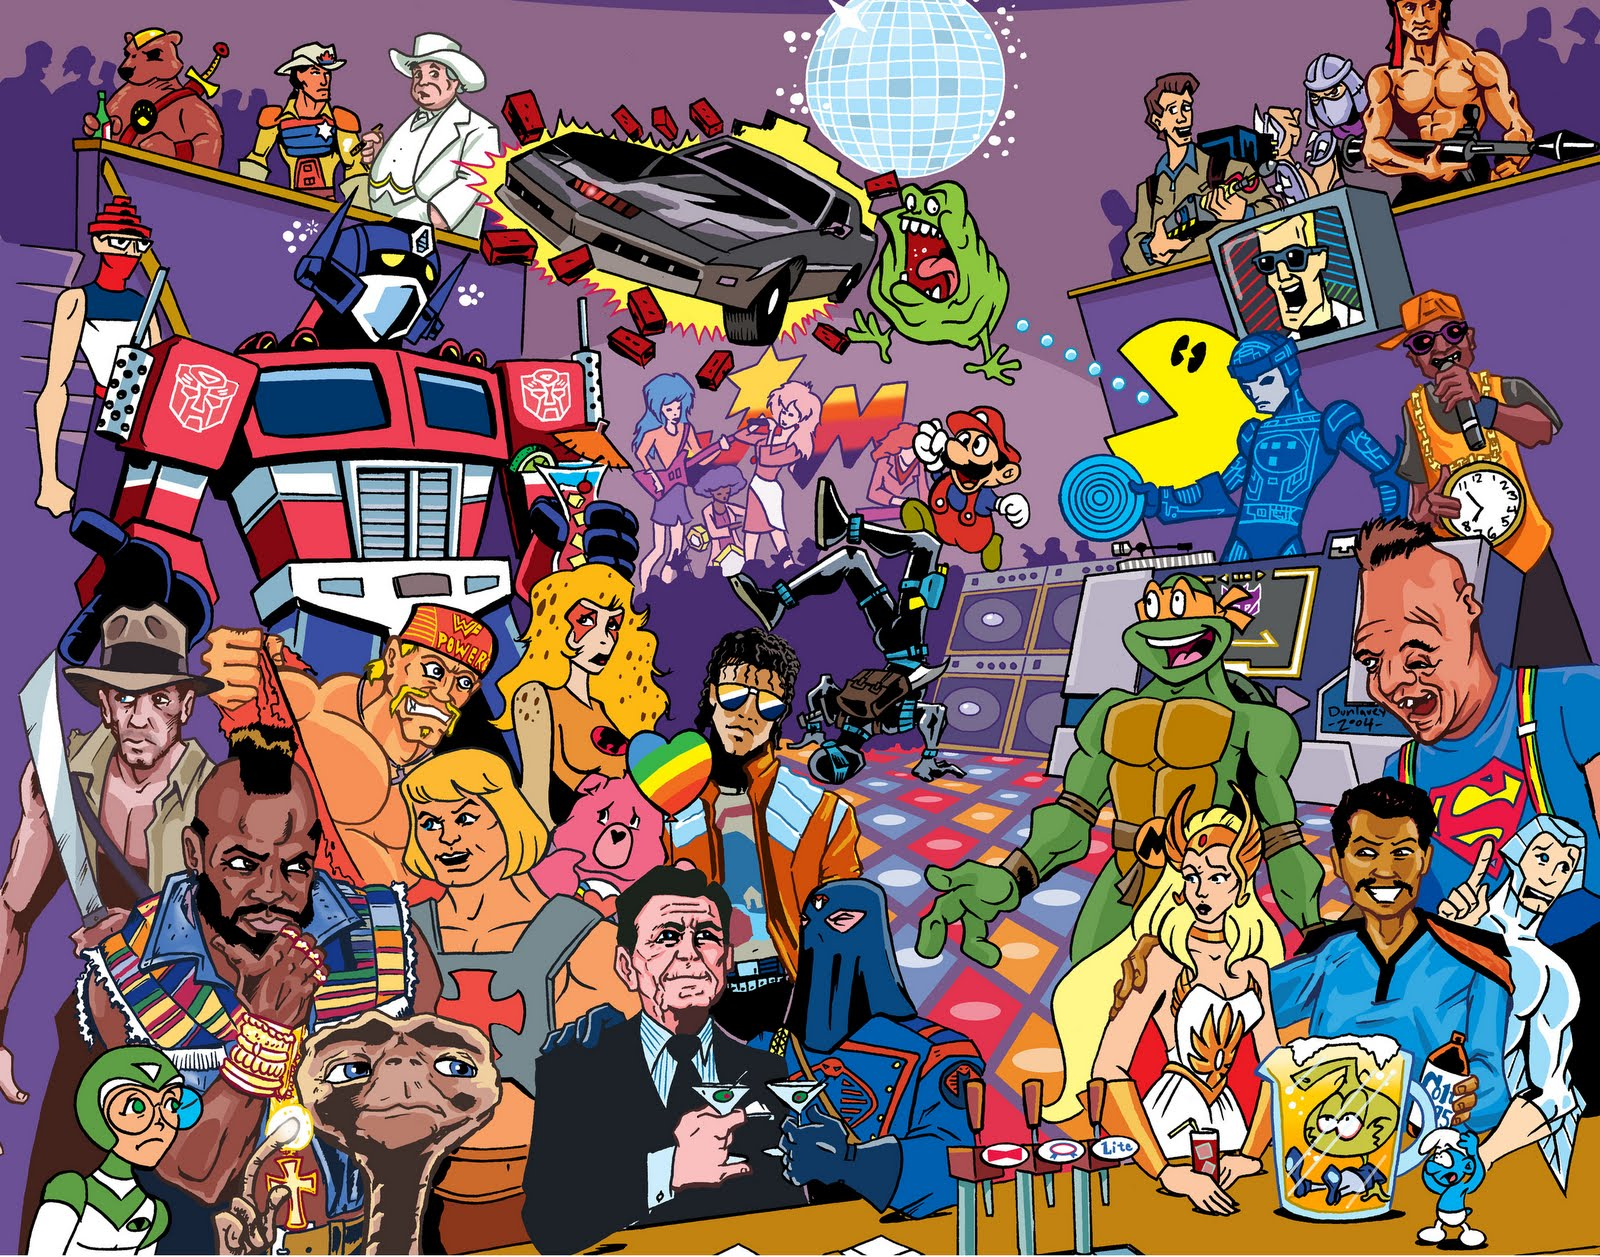 The 80s Computer Wallpapers Desktop Backgrounds 1600x1257 ID 1600x1257